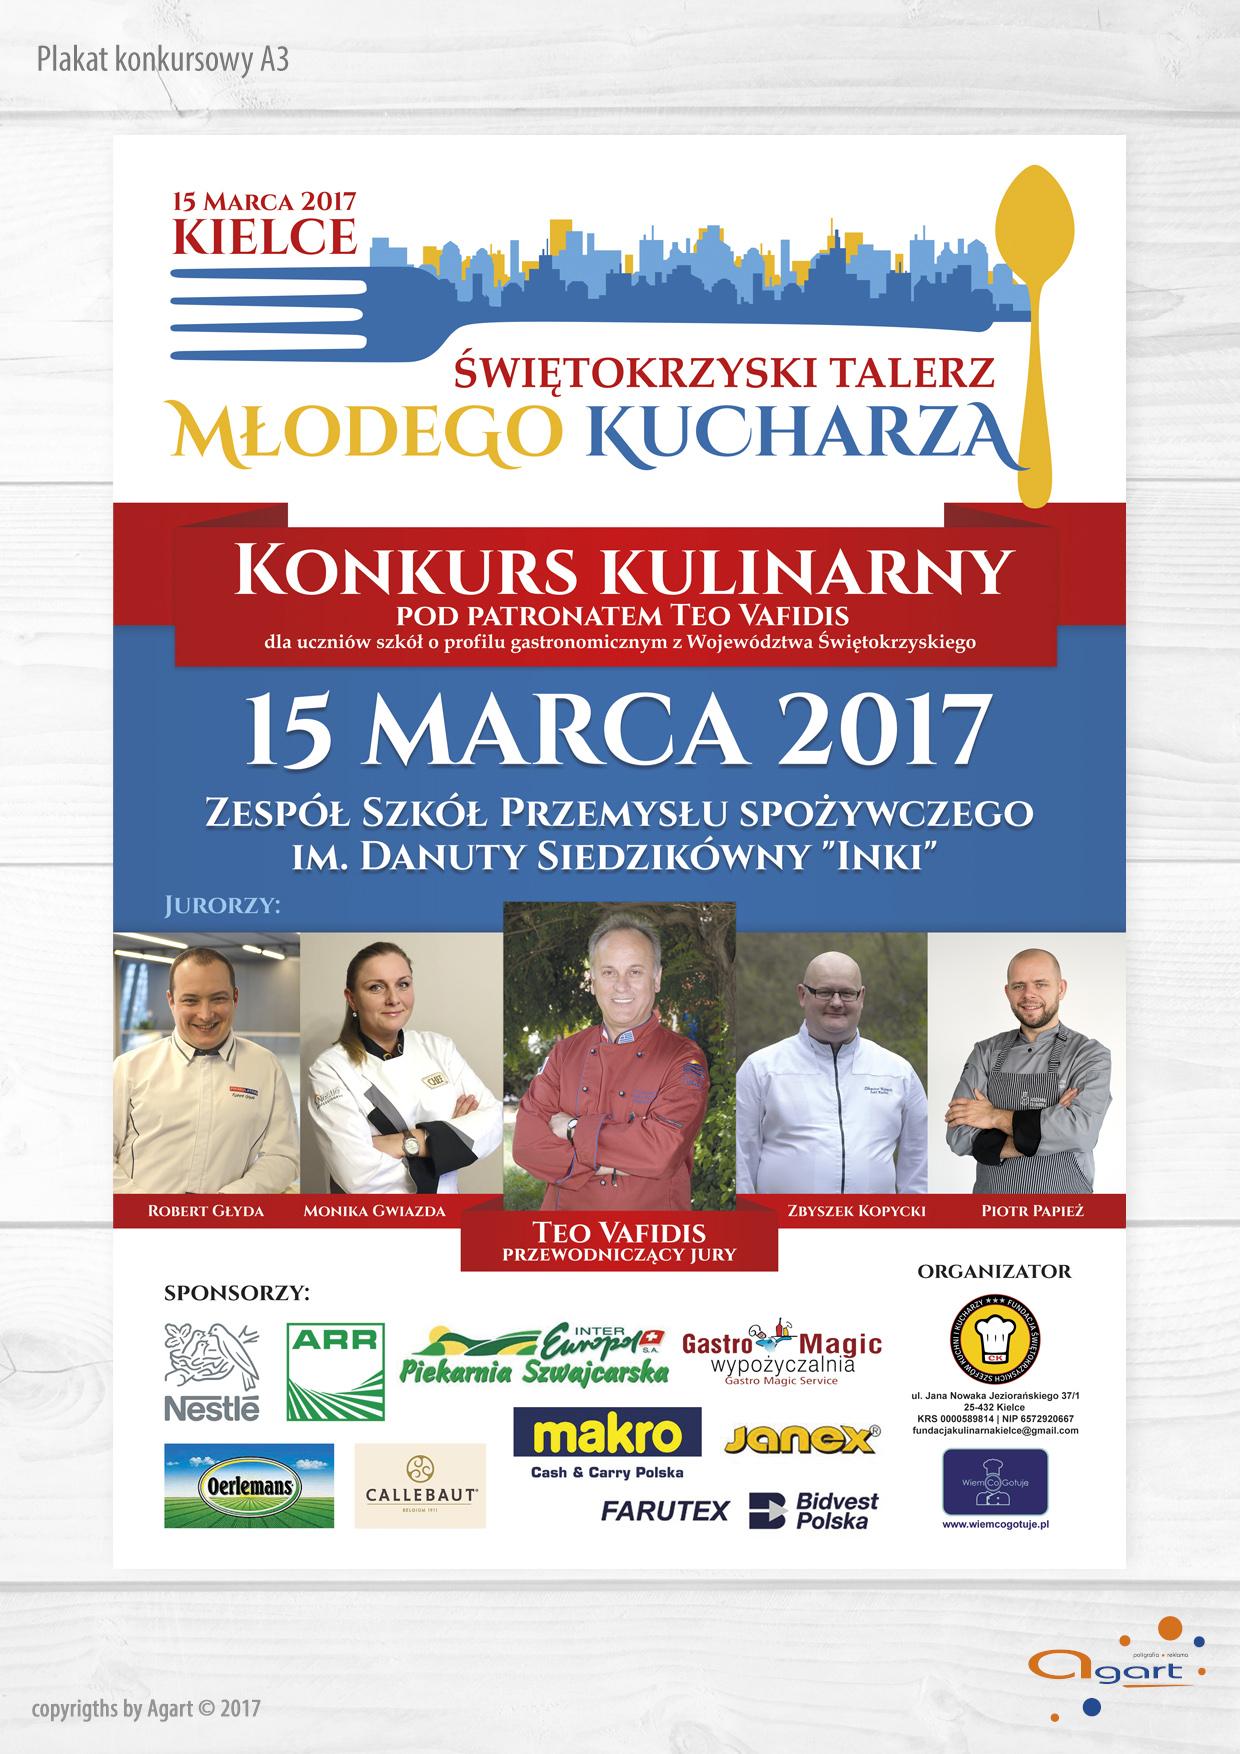 plakat konkurs kulinarny A3 v3